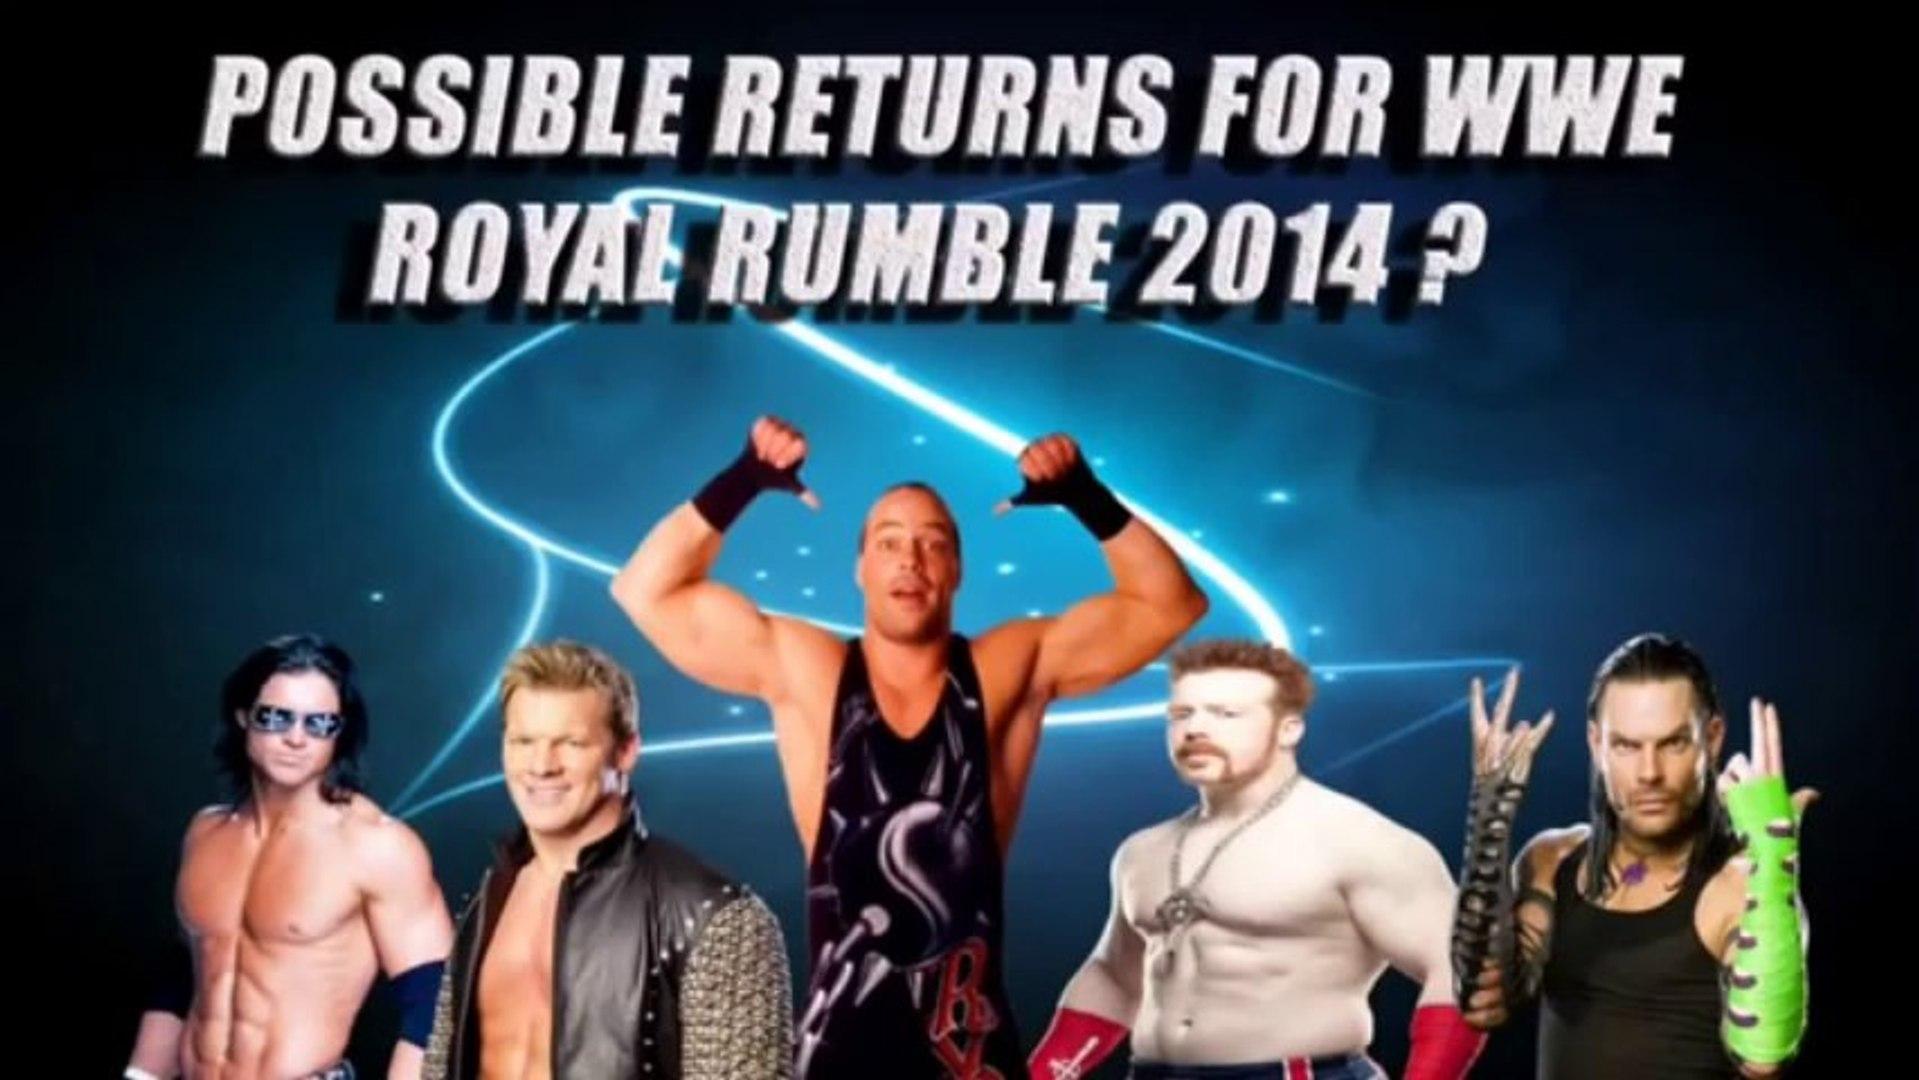 2014 show royal rumble wwe full Royal Rumble